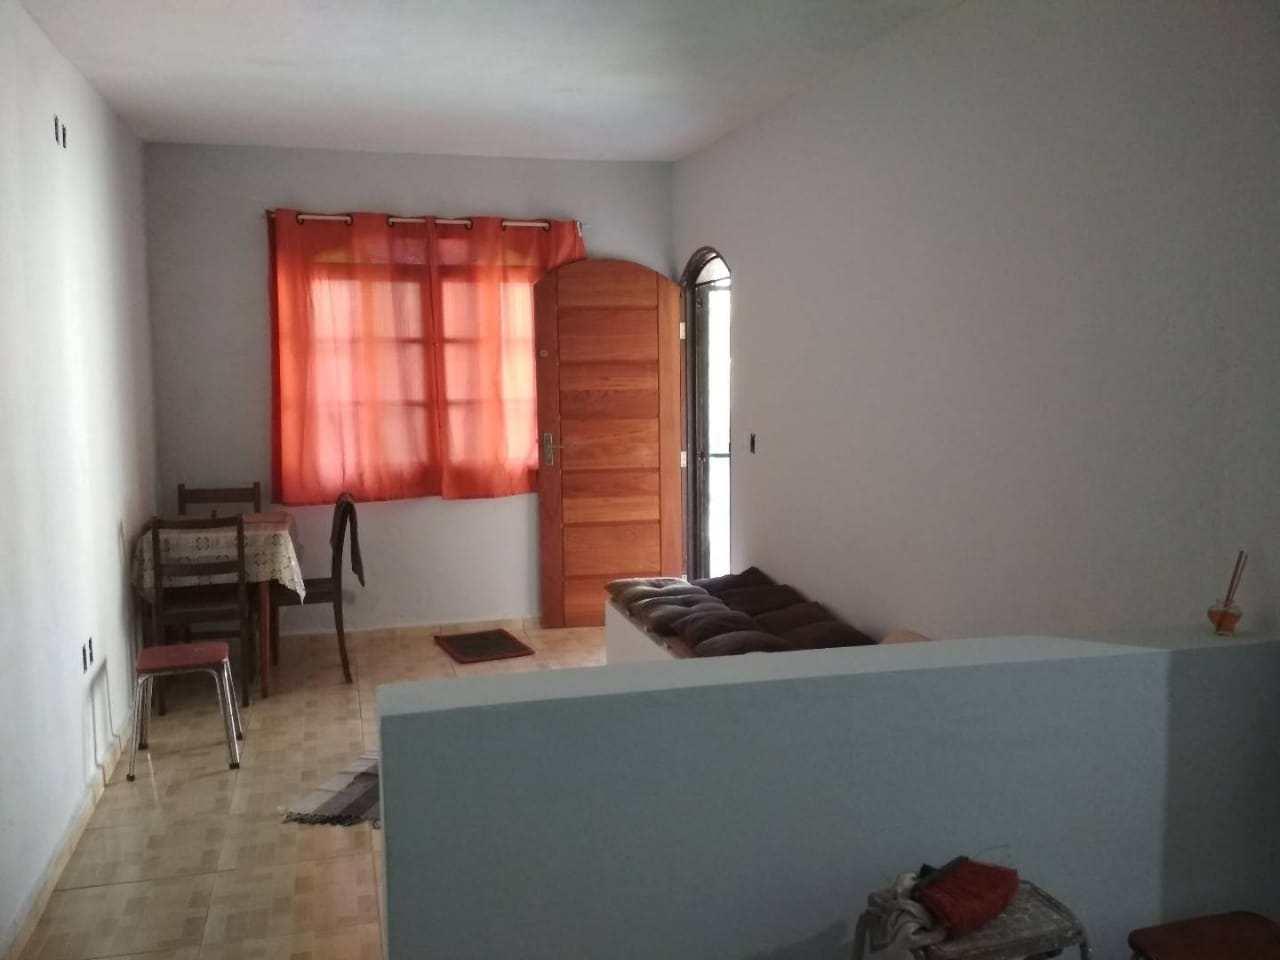 Casa com 2 dorms, Raul Cury, Itanhaém - R$ 230 mil, Cod: 5226